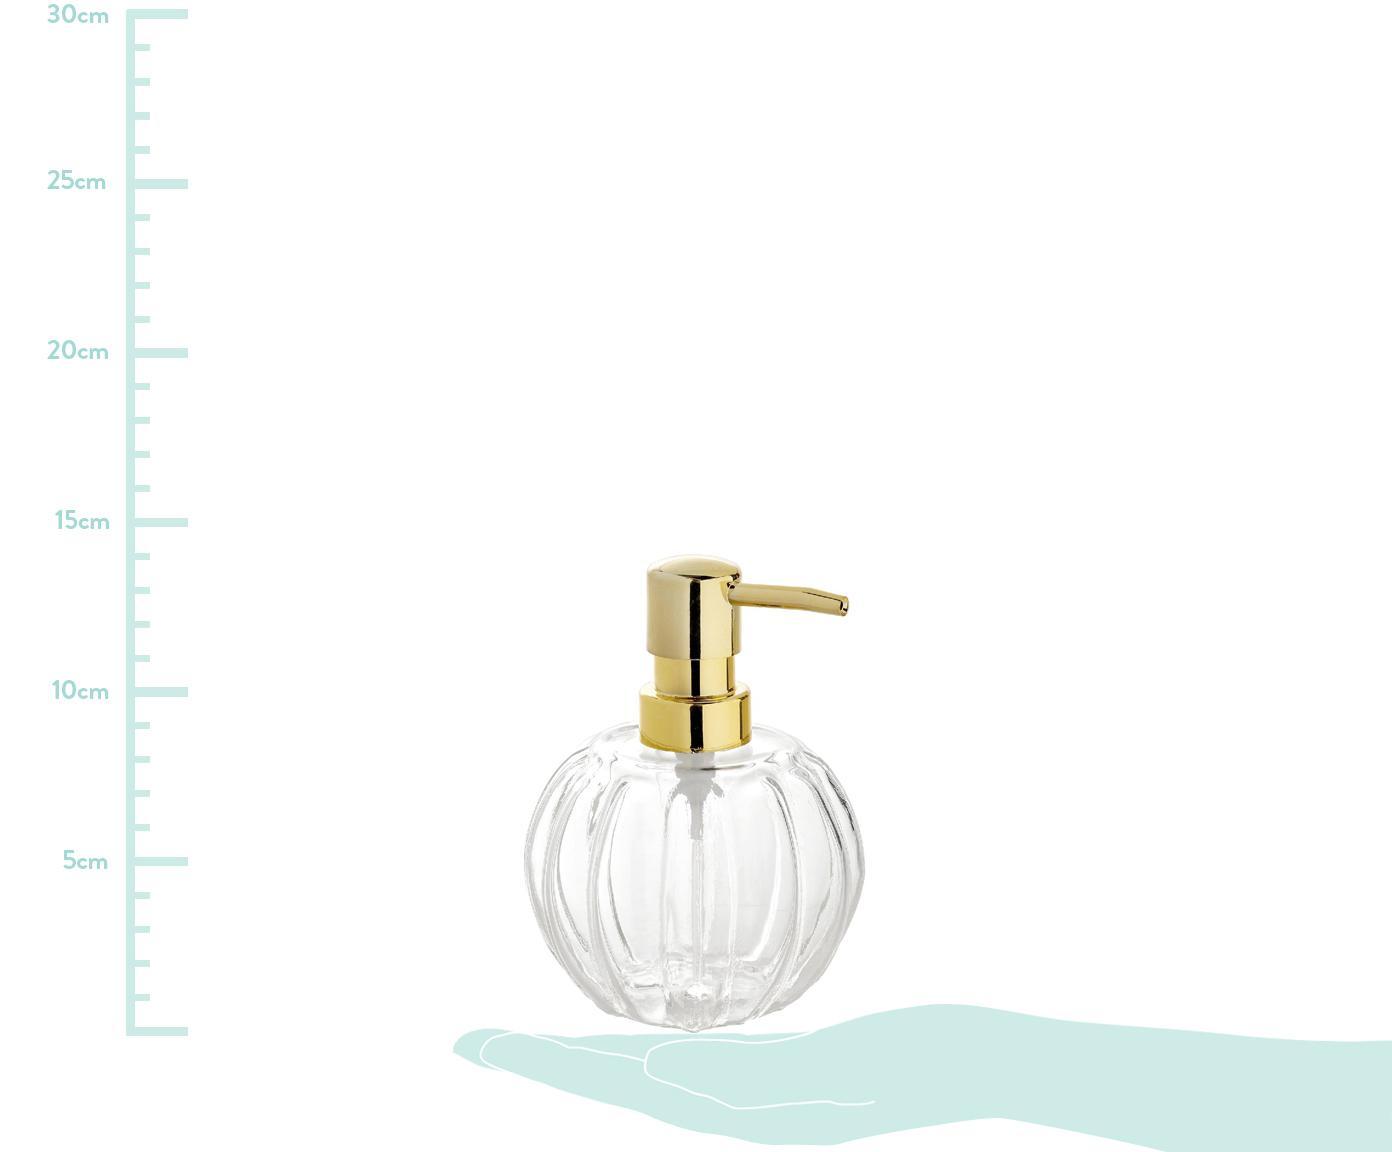 Seifenspender Stripes, Behälter: Glas, Pumpkopf: Kunststoff, Transparent, Messingfarben, Ø 10 x H 15 cm